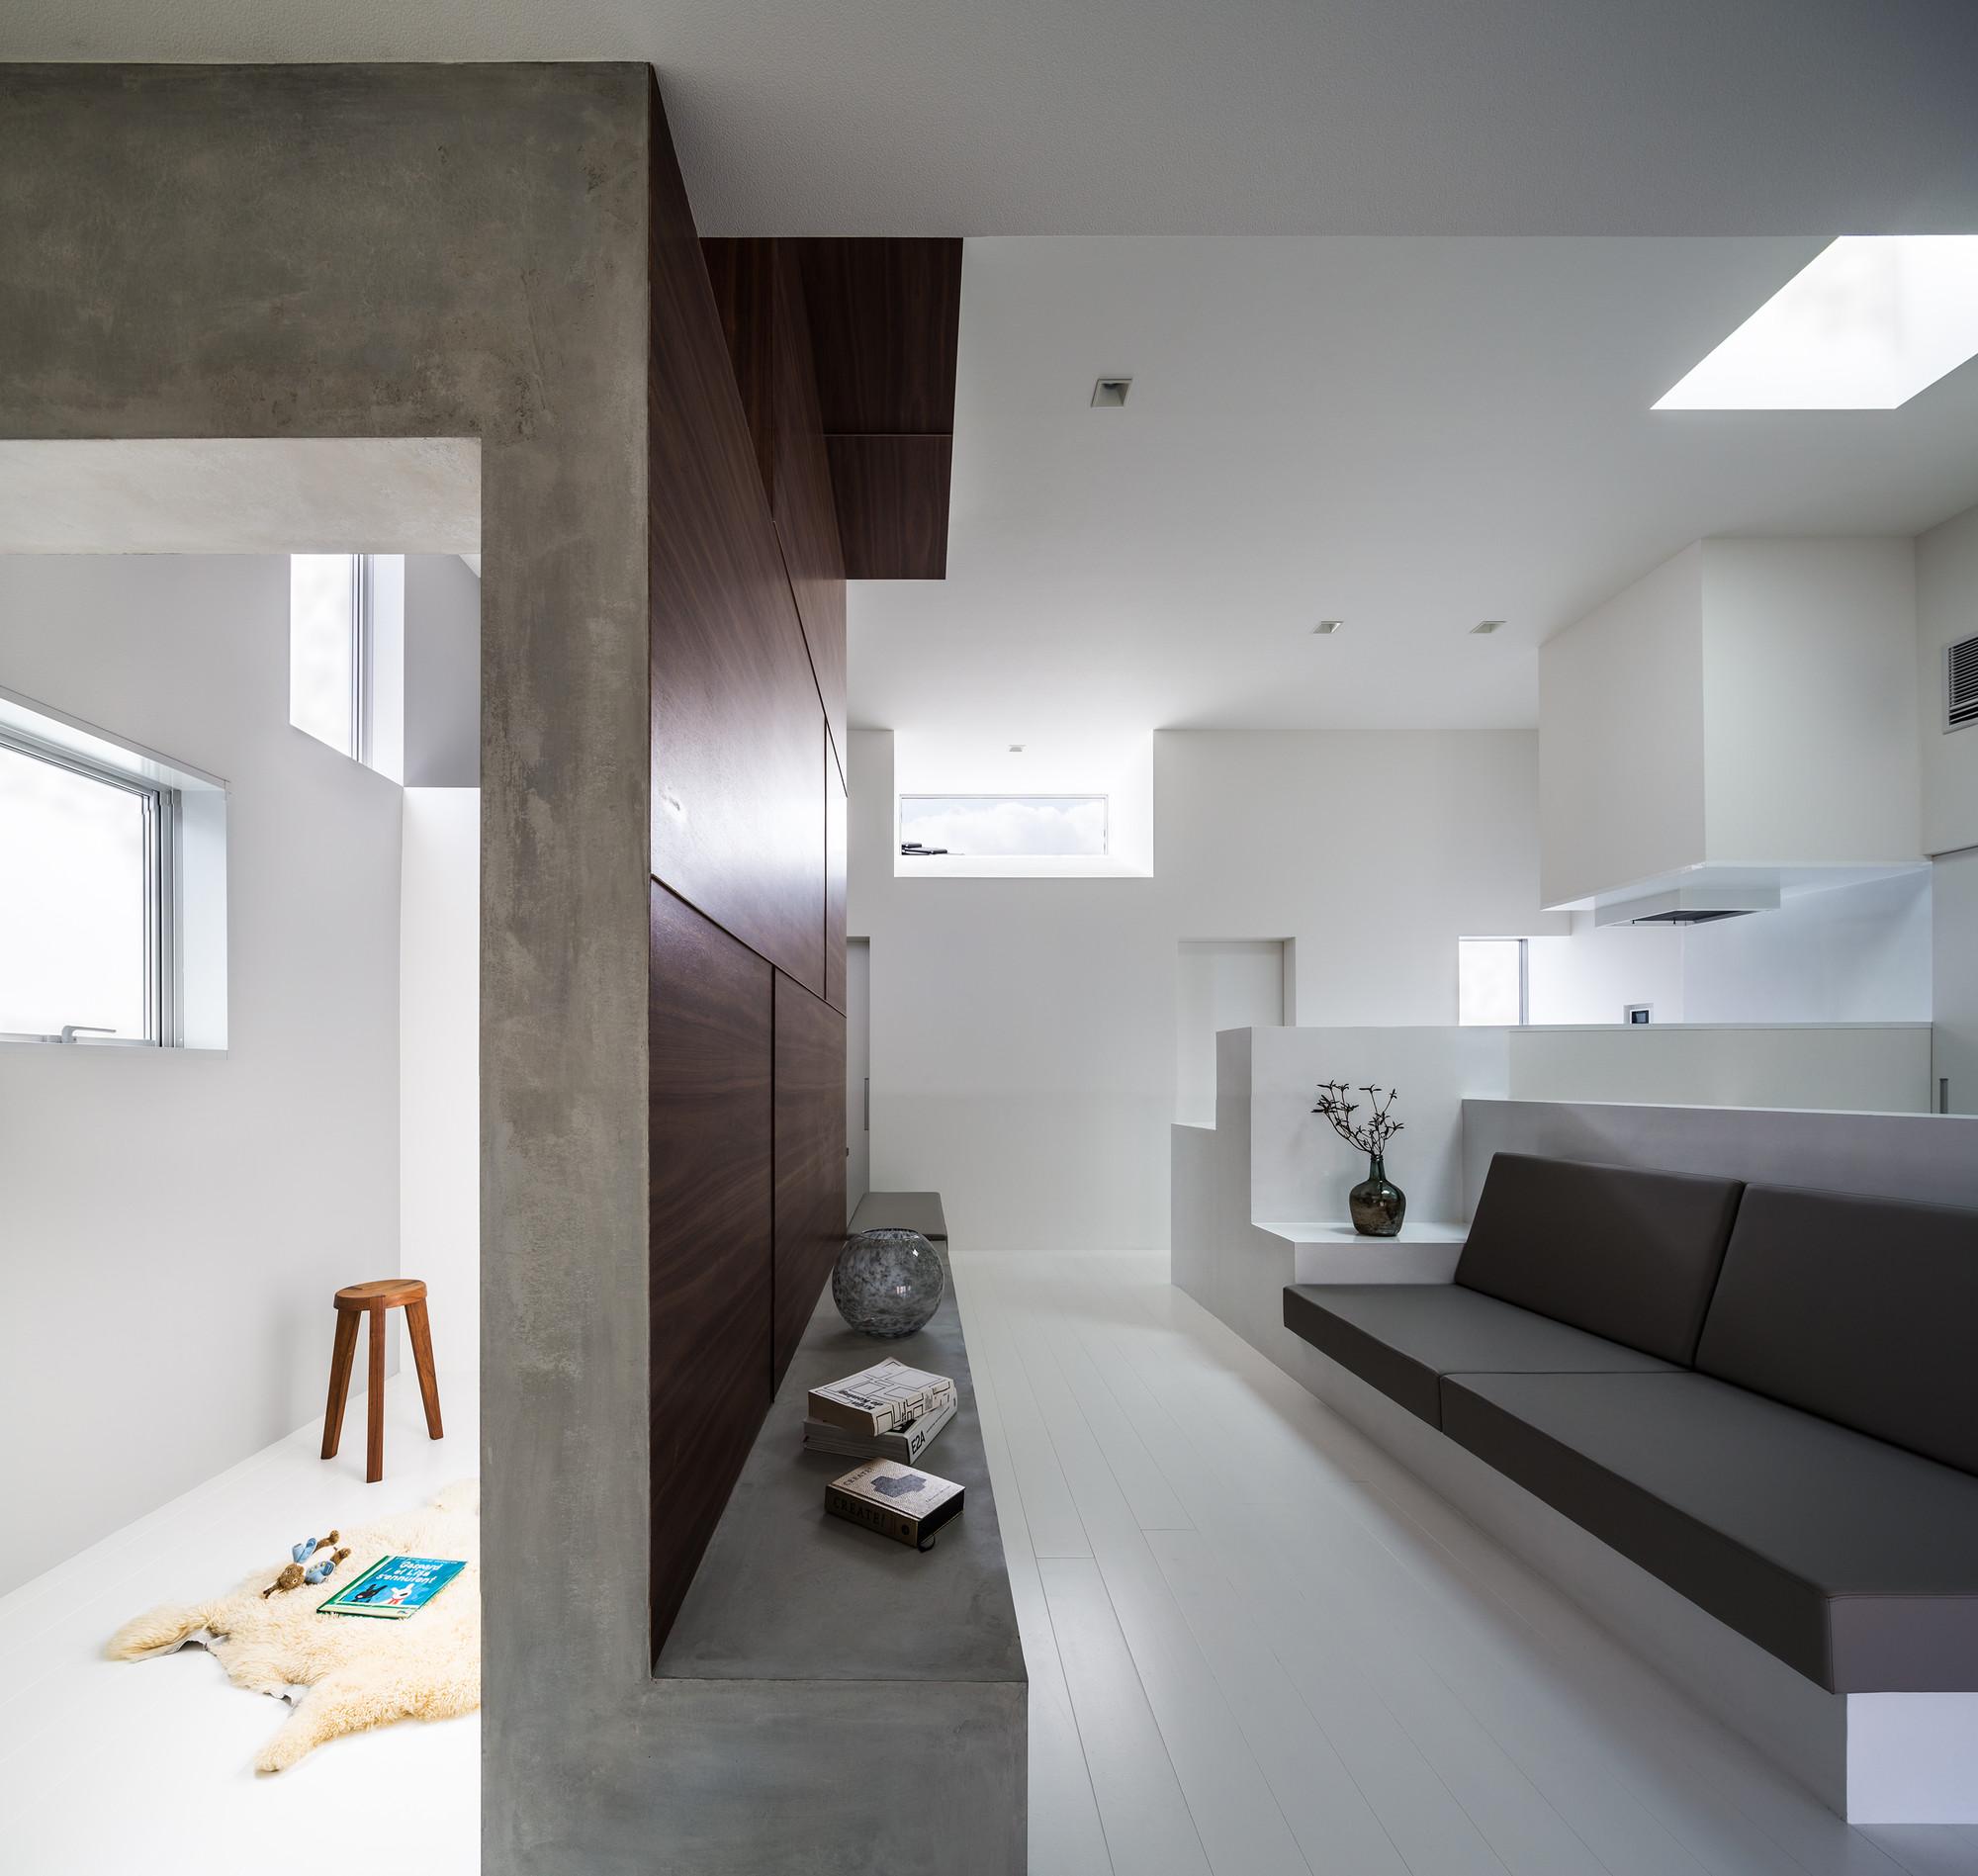 Cozy House / FORM | Kouichi Kimura Architects, © Yoshihiro Asada